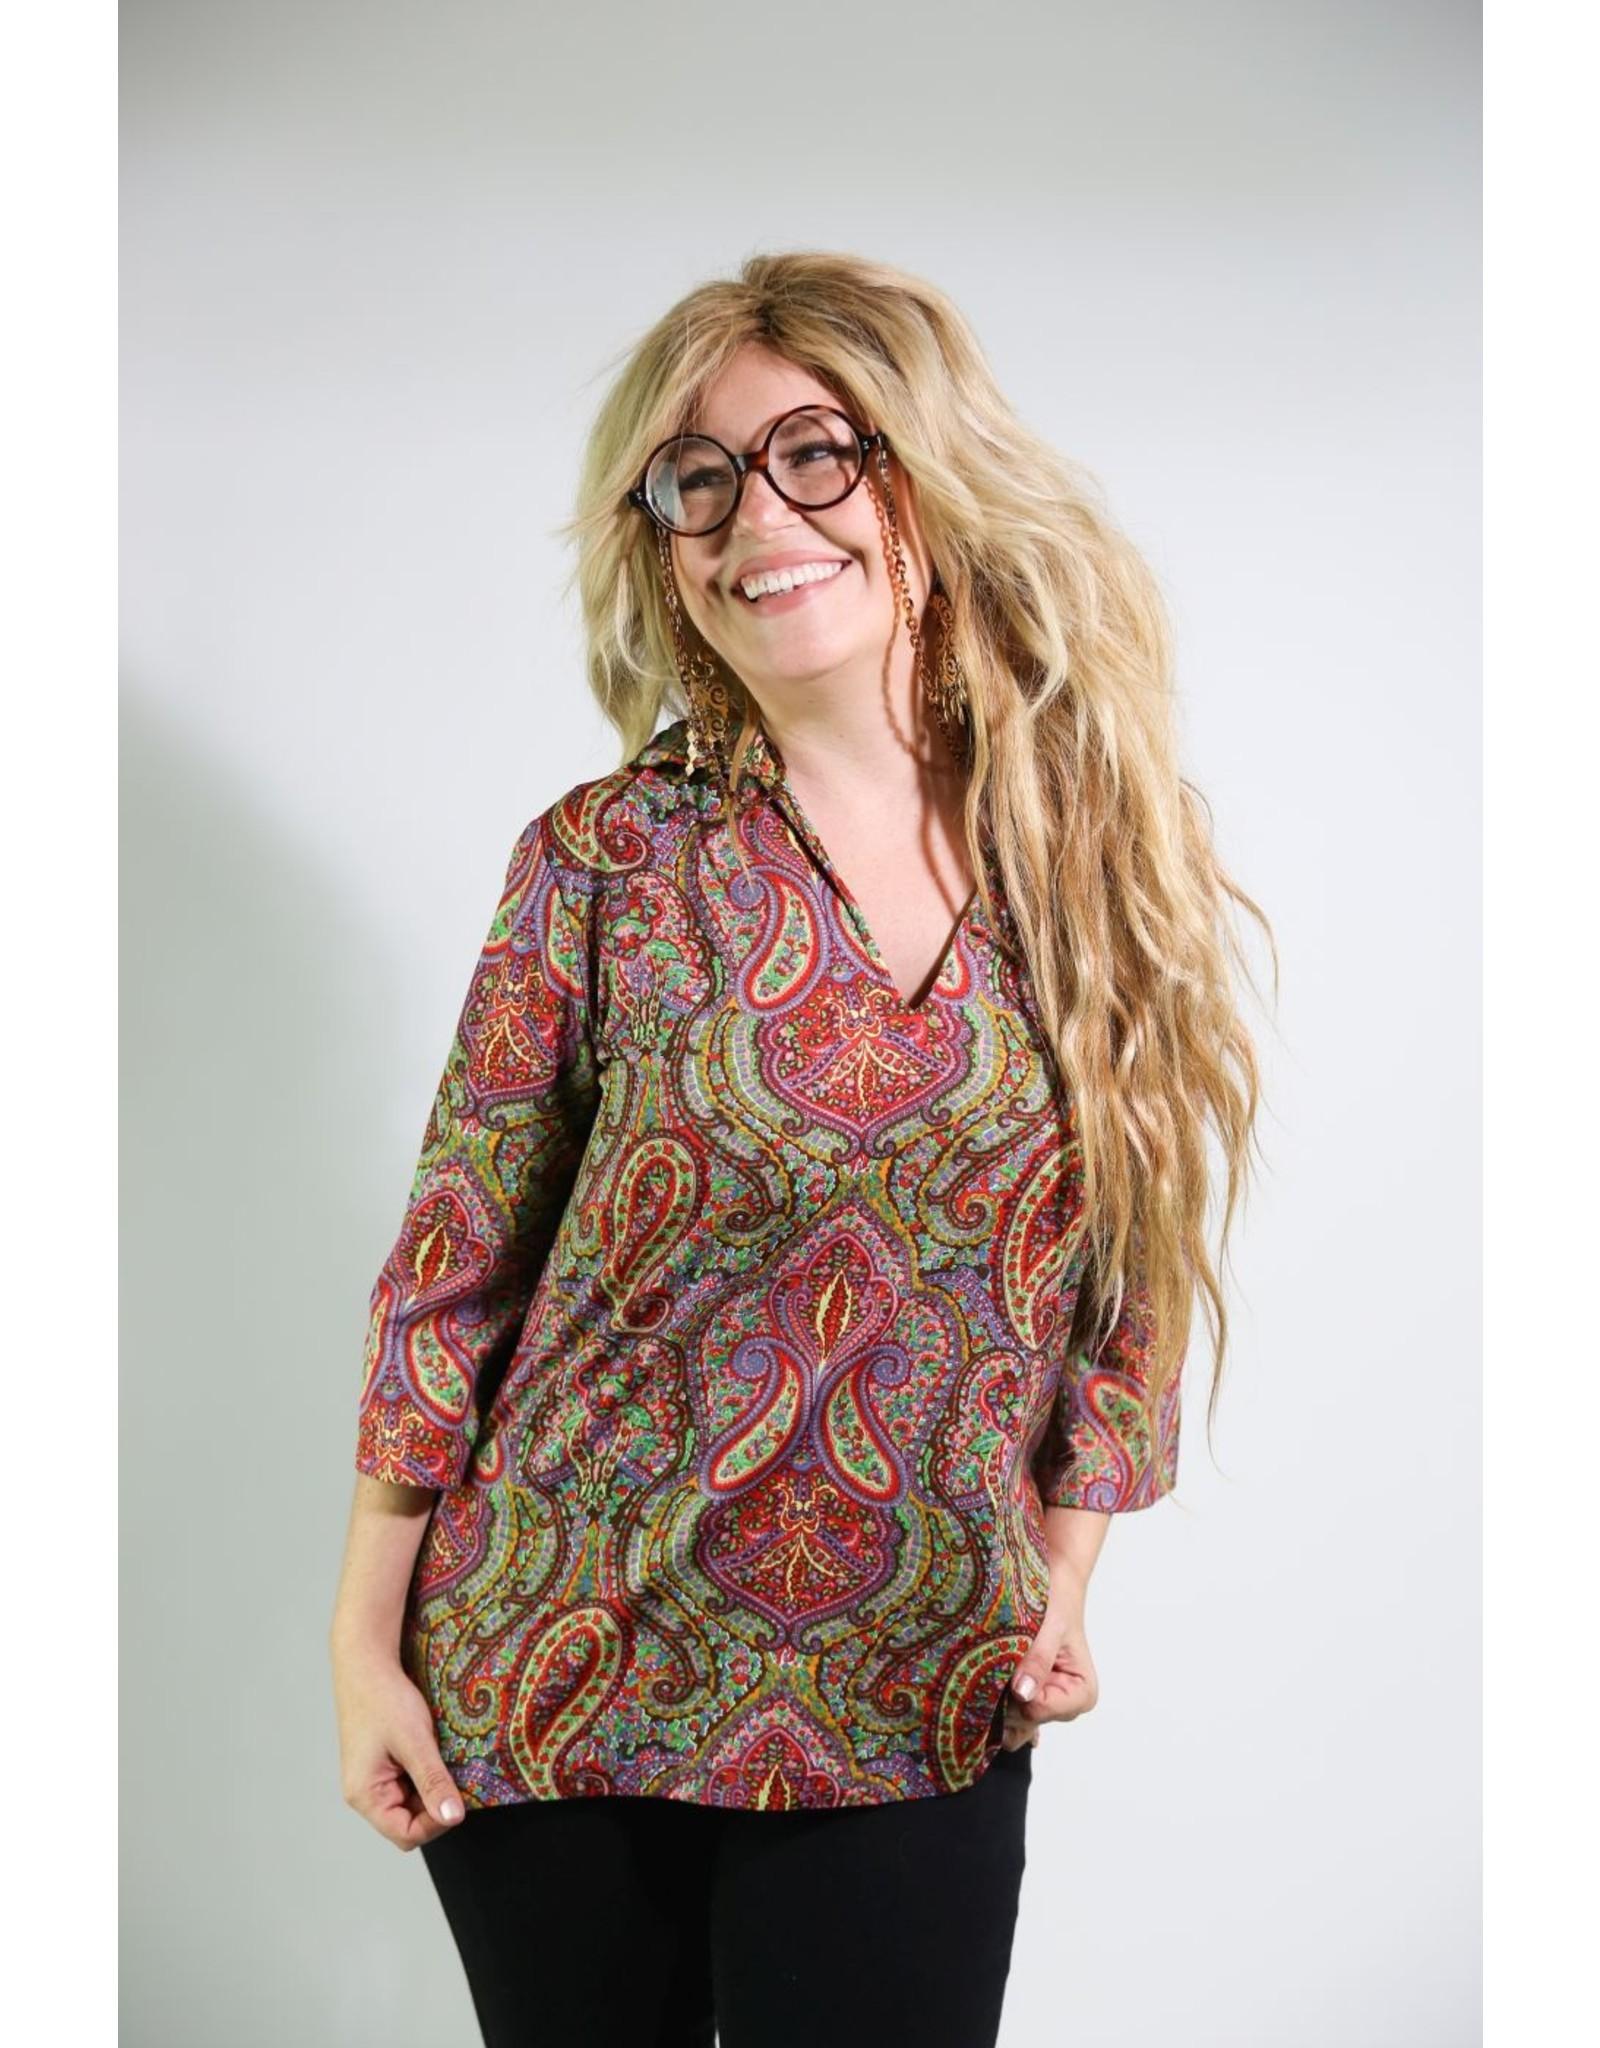 1970's Long Sleeved Rainbow Paisley Shirt